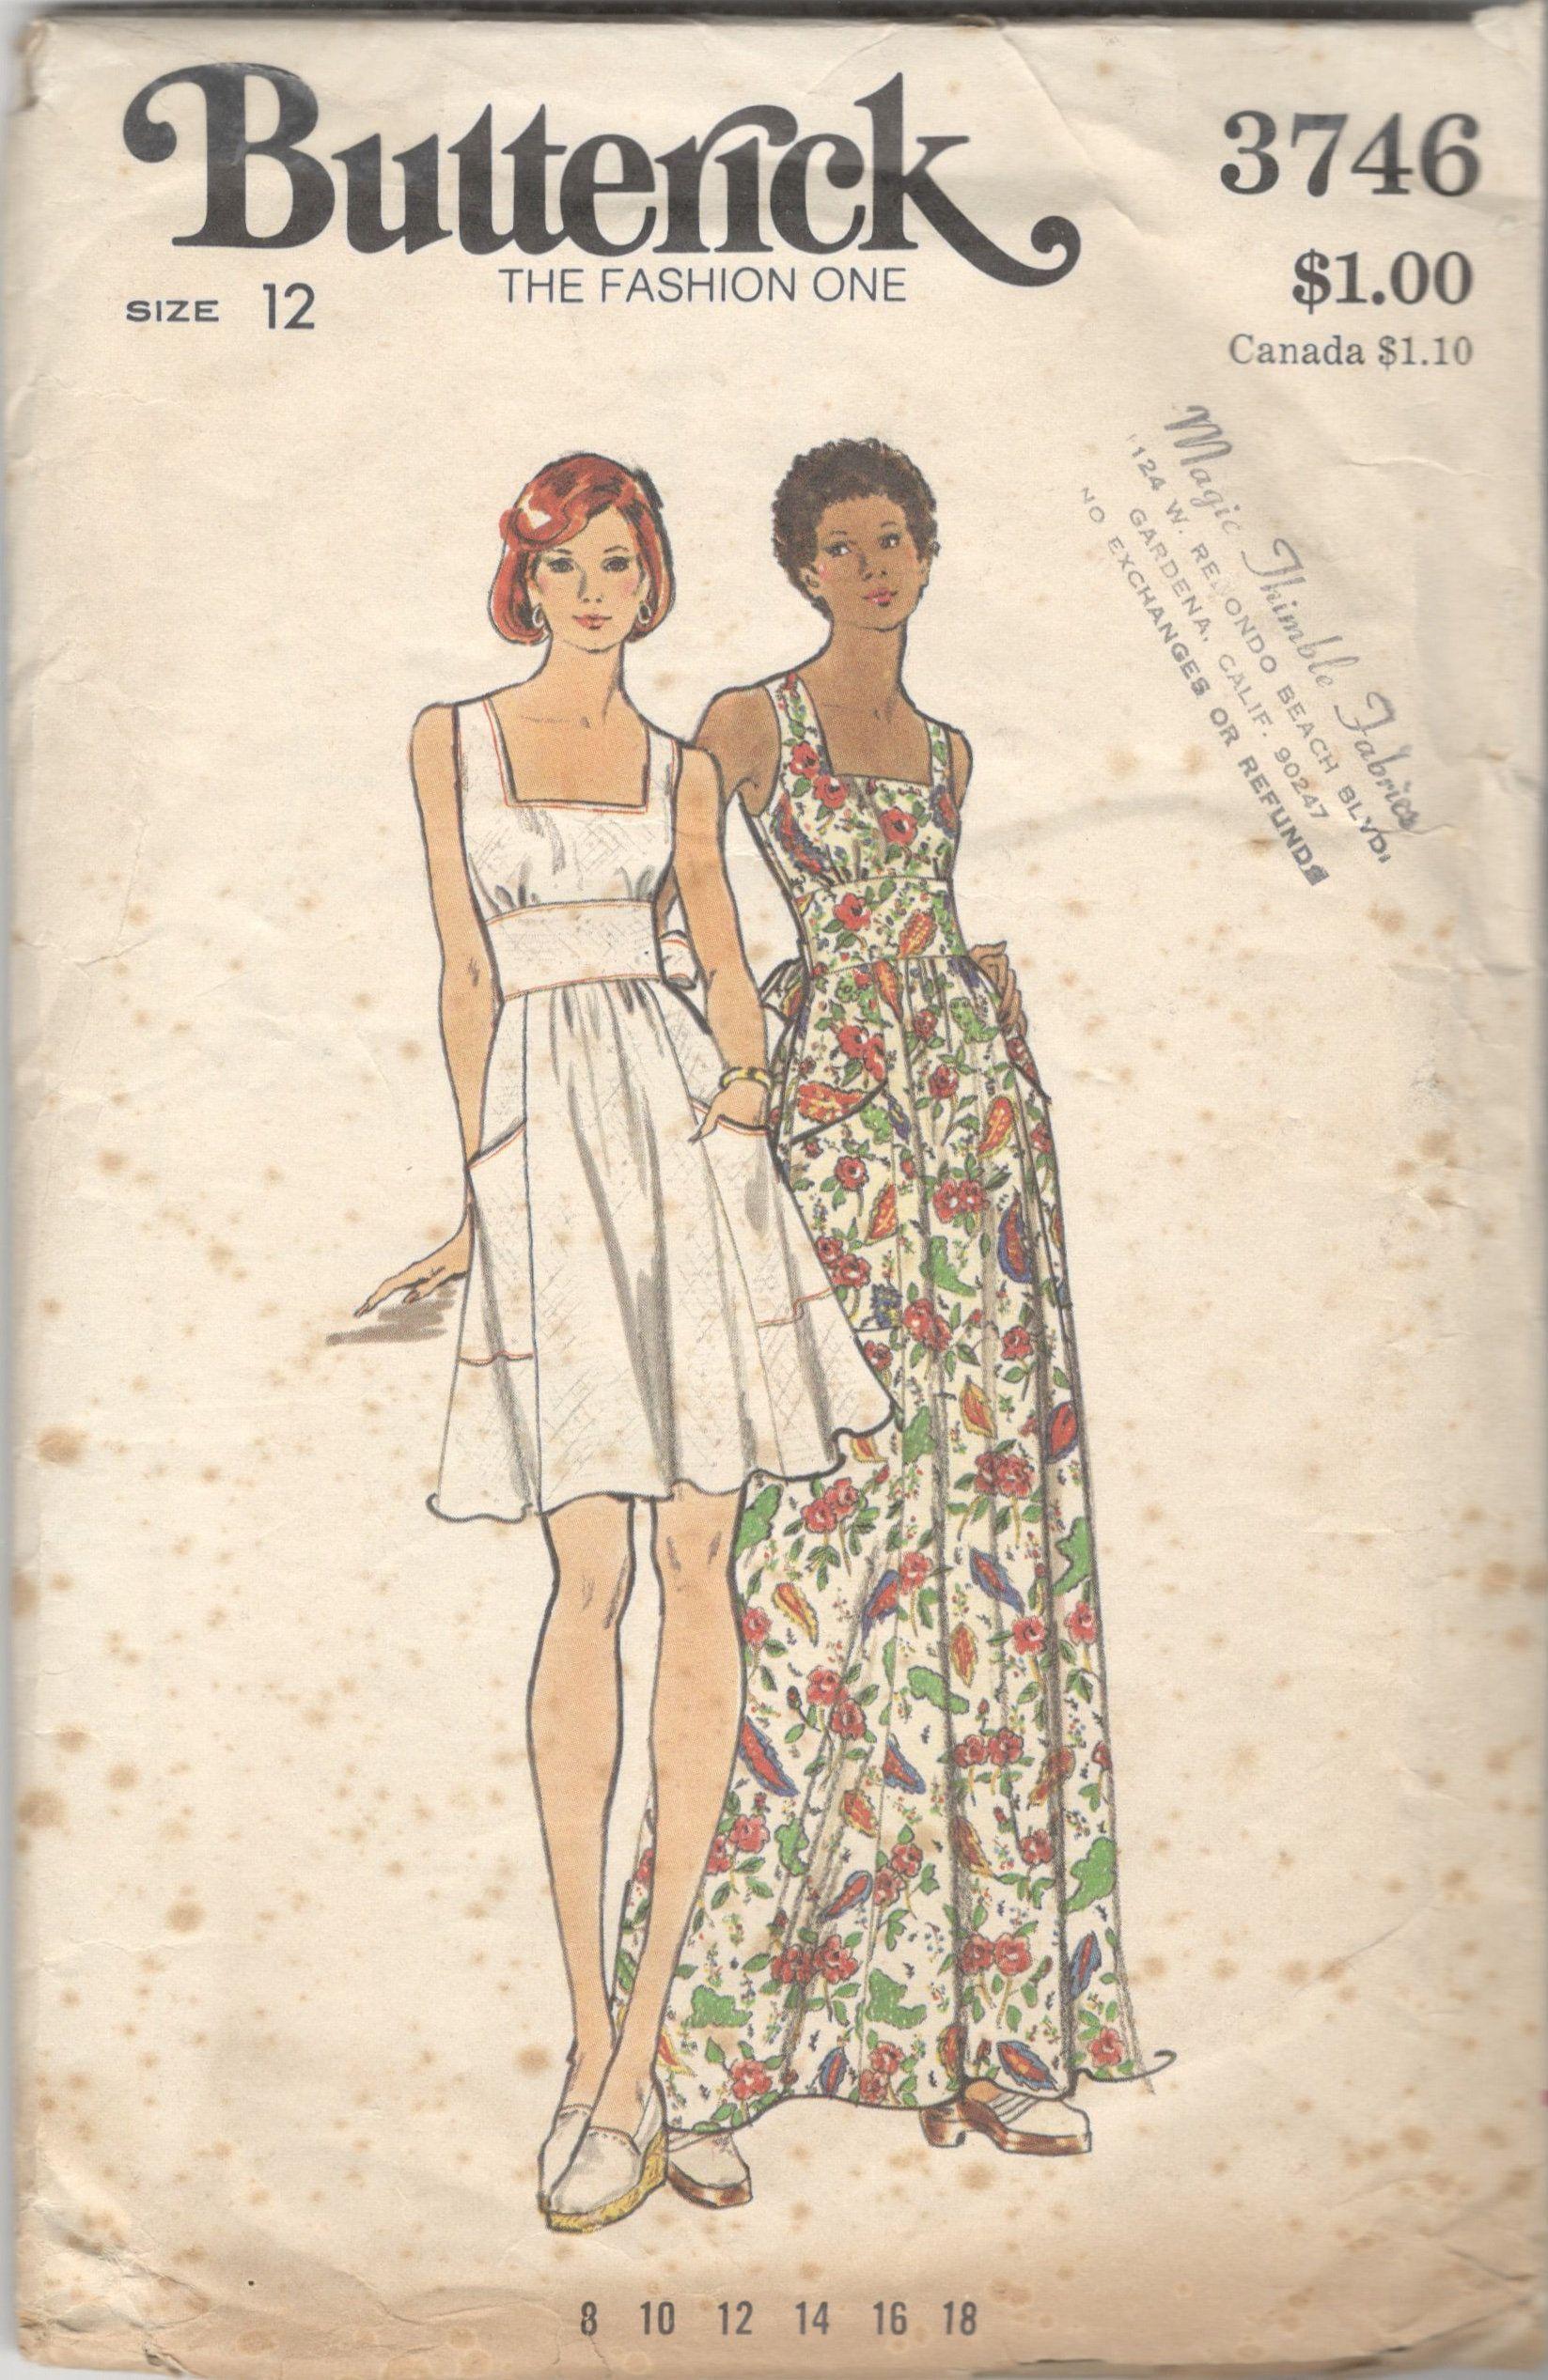 Butterick 3746 3746 1970s Misses Sleeveless Dress Pattern Etsy In 2020 Butterick Sewing Patterns Sleeveless Dress Pattern Sewing Pattern Sizes